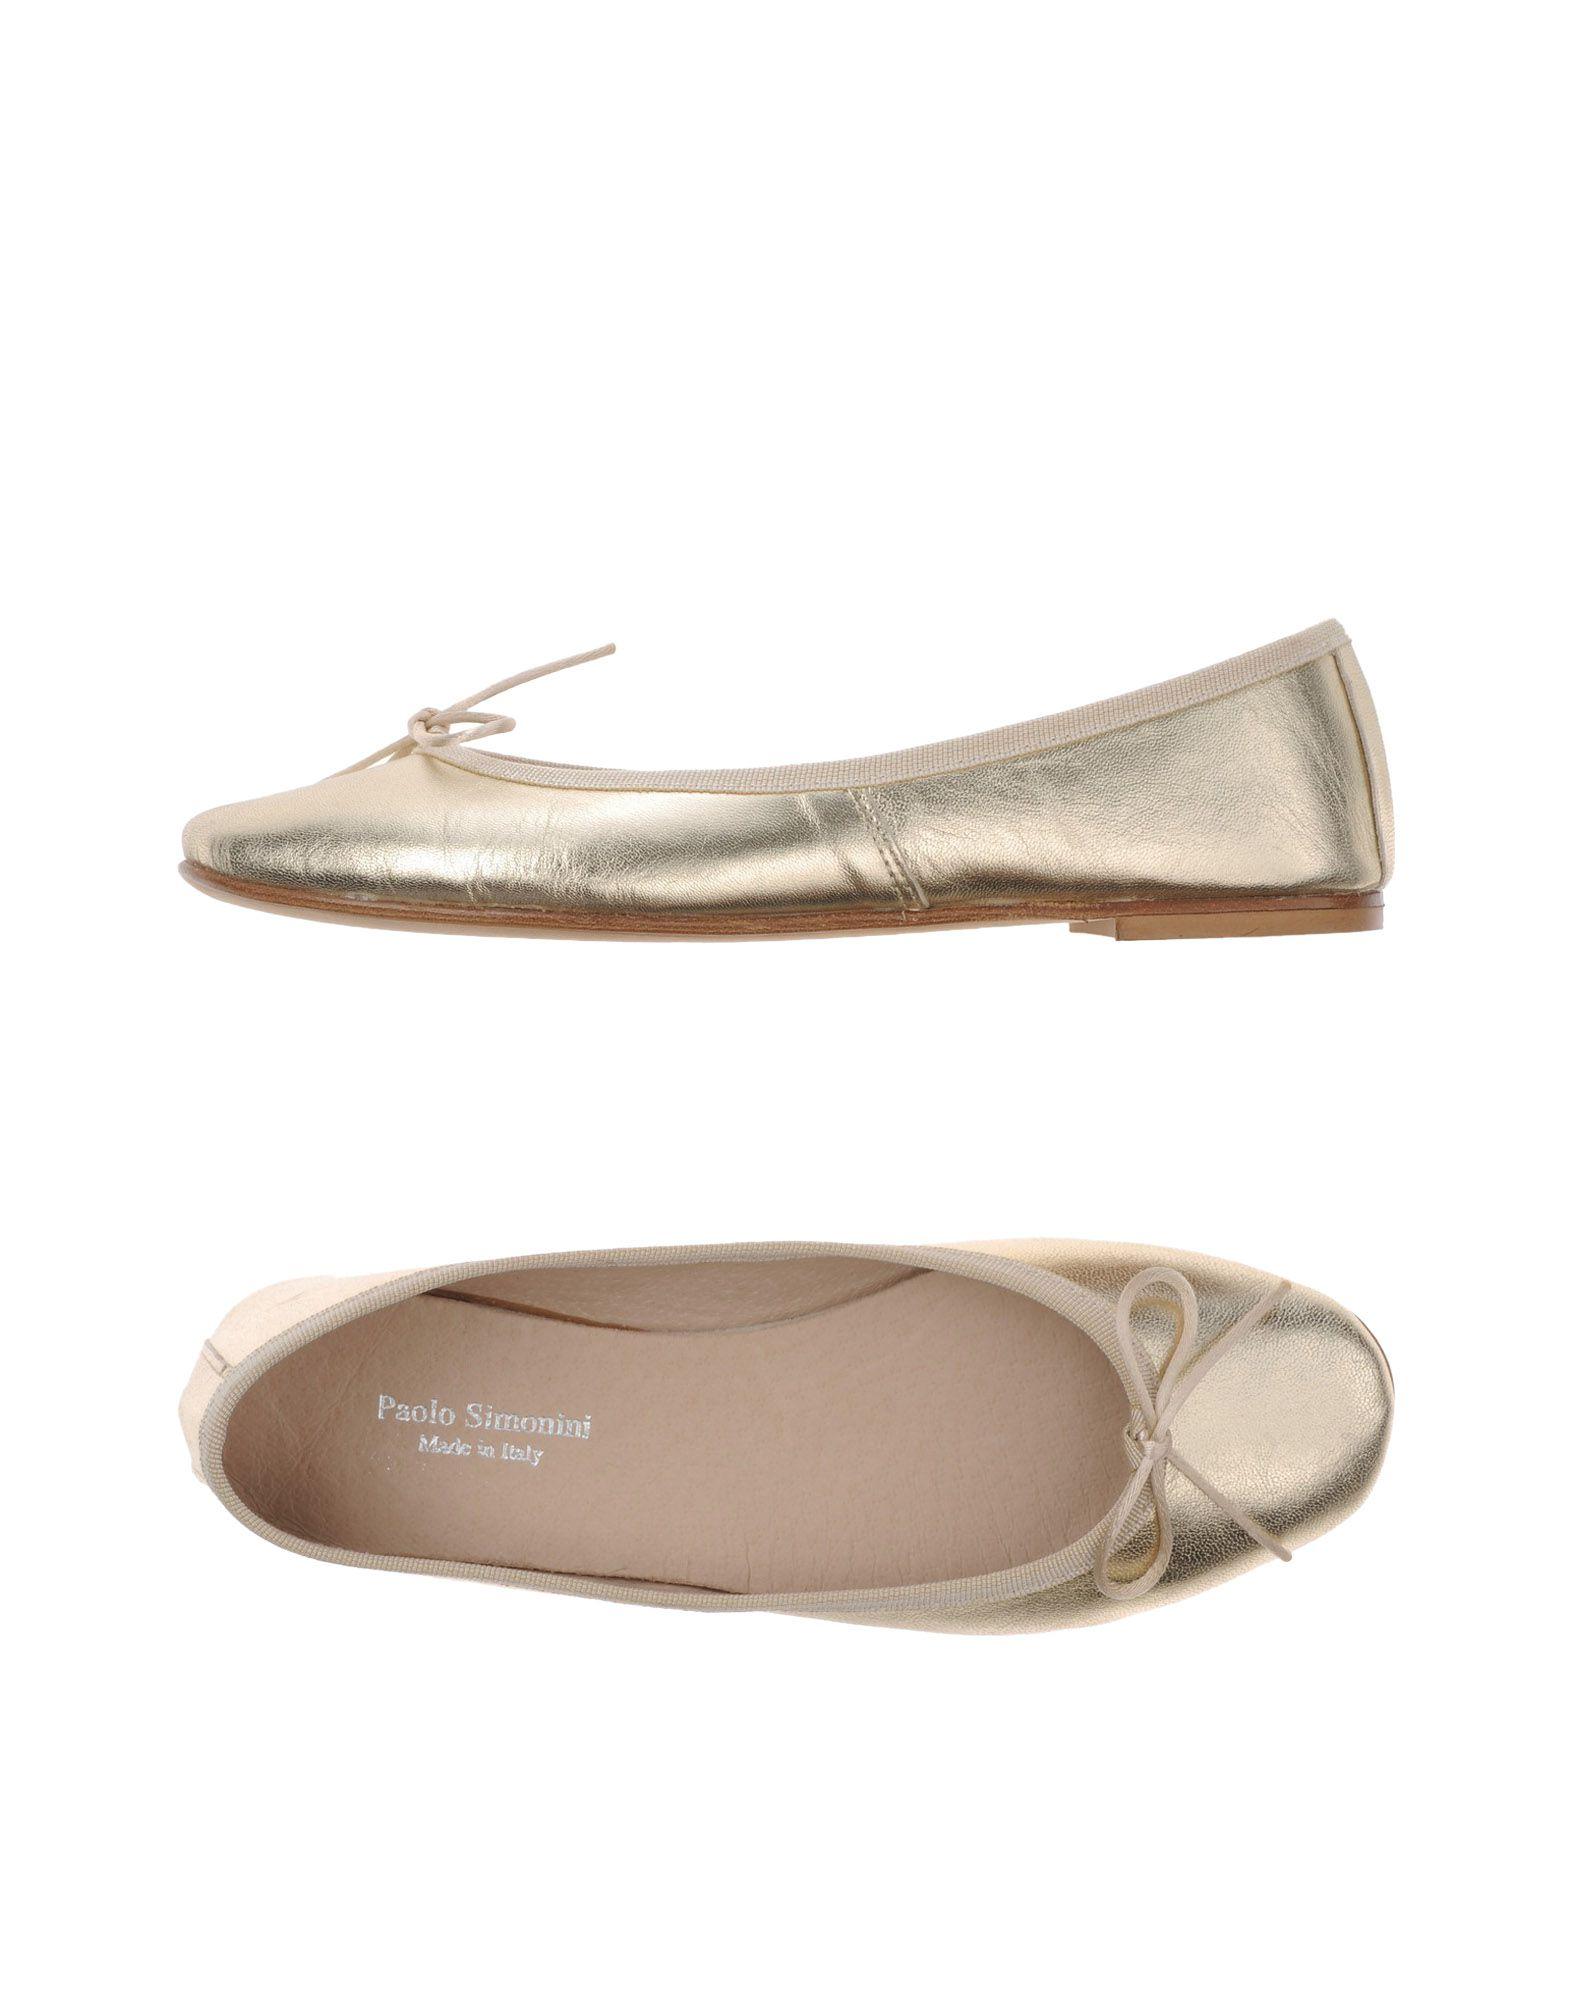 Paolo Simonini Ballerinas Damen  11107659PT Gute Qualität beliebte Schuhe